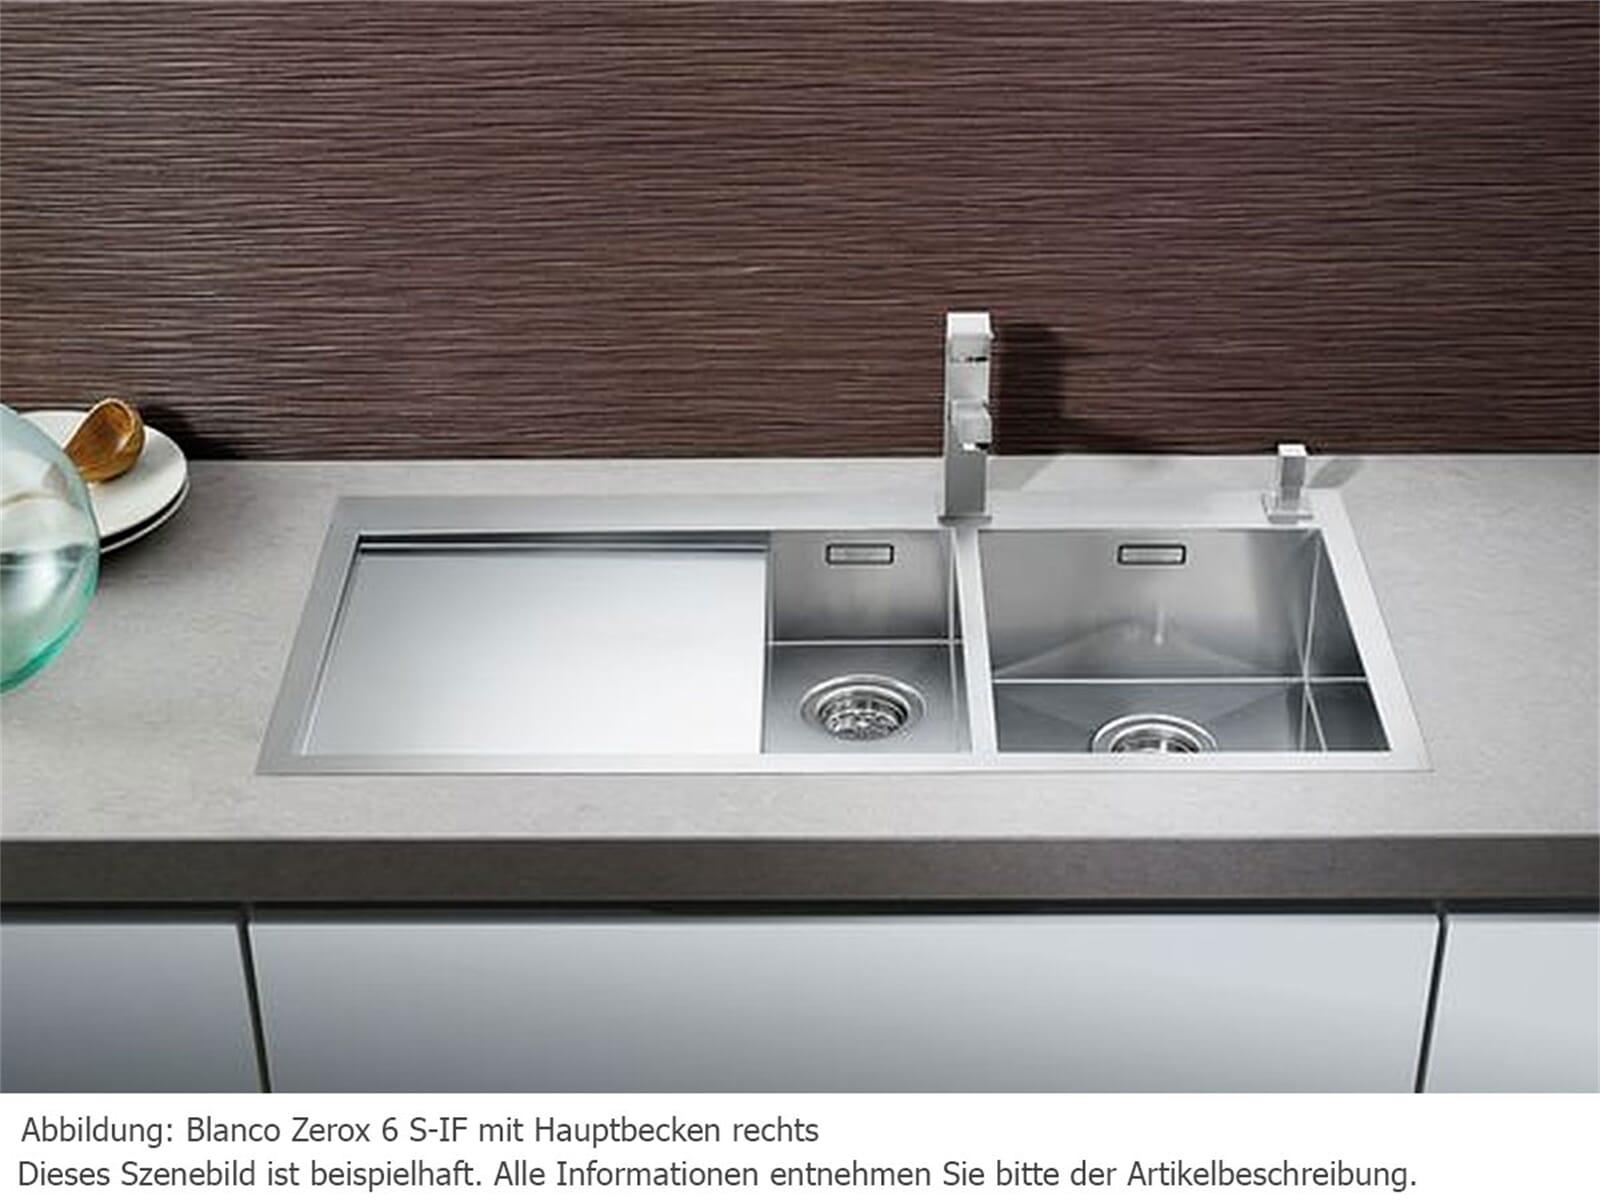 blanco zerox 6 s if edelstahlsp le seidenglanz m hlau. Black Bedroom Furniture Sets. Home Design Ideas